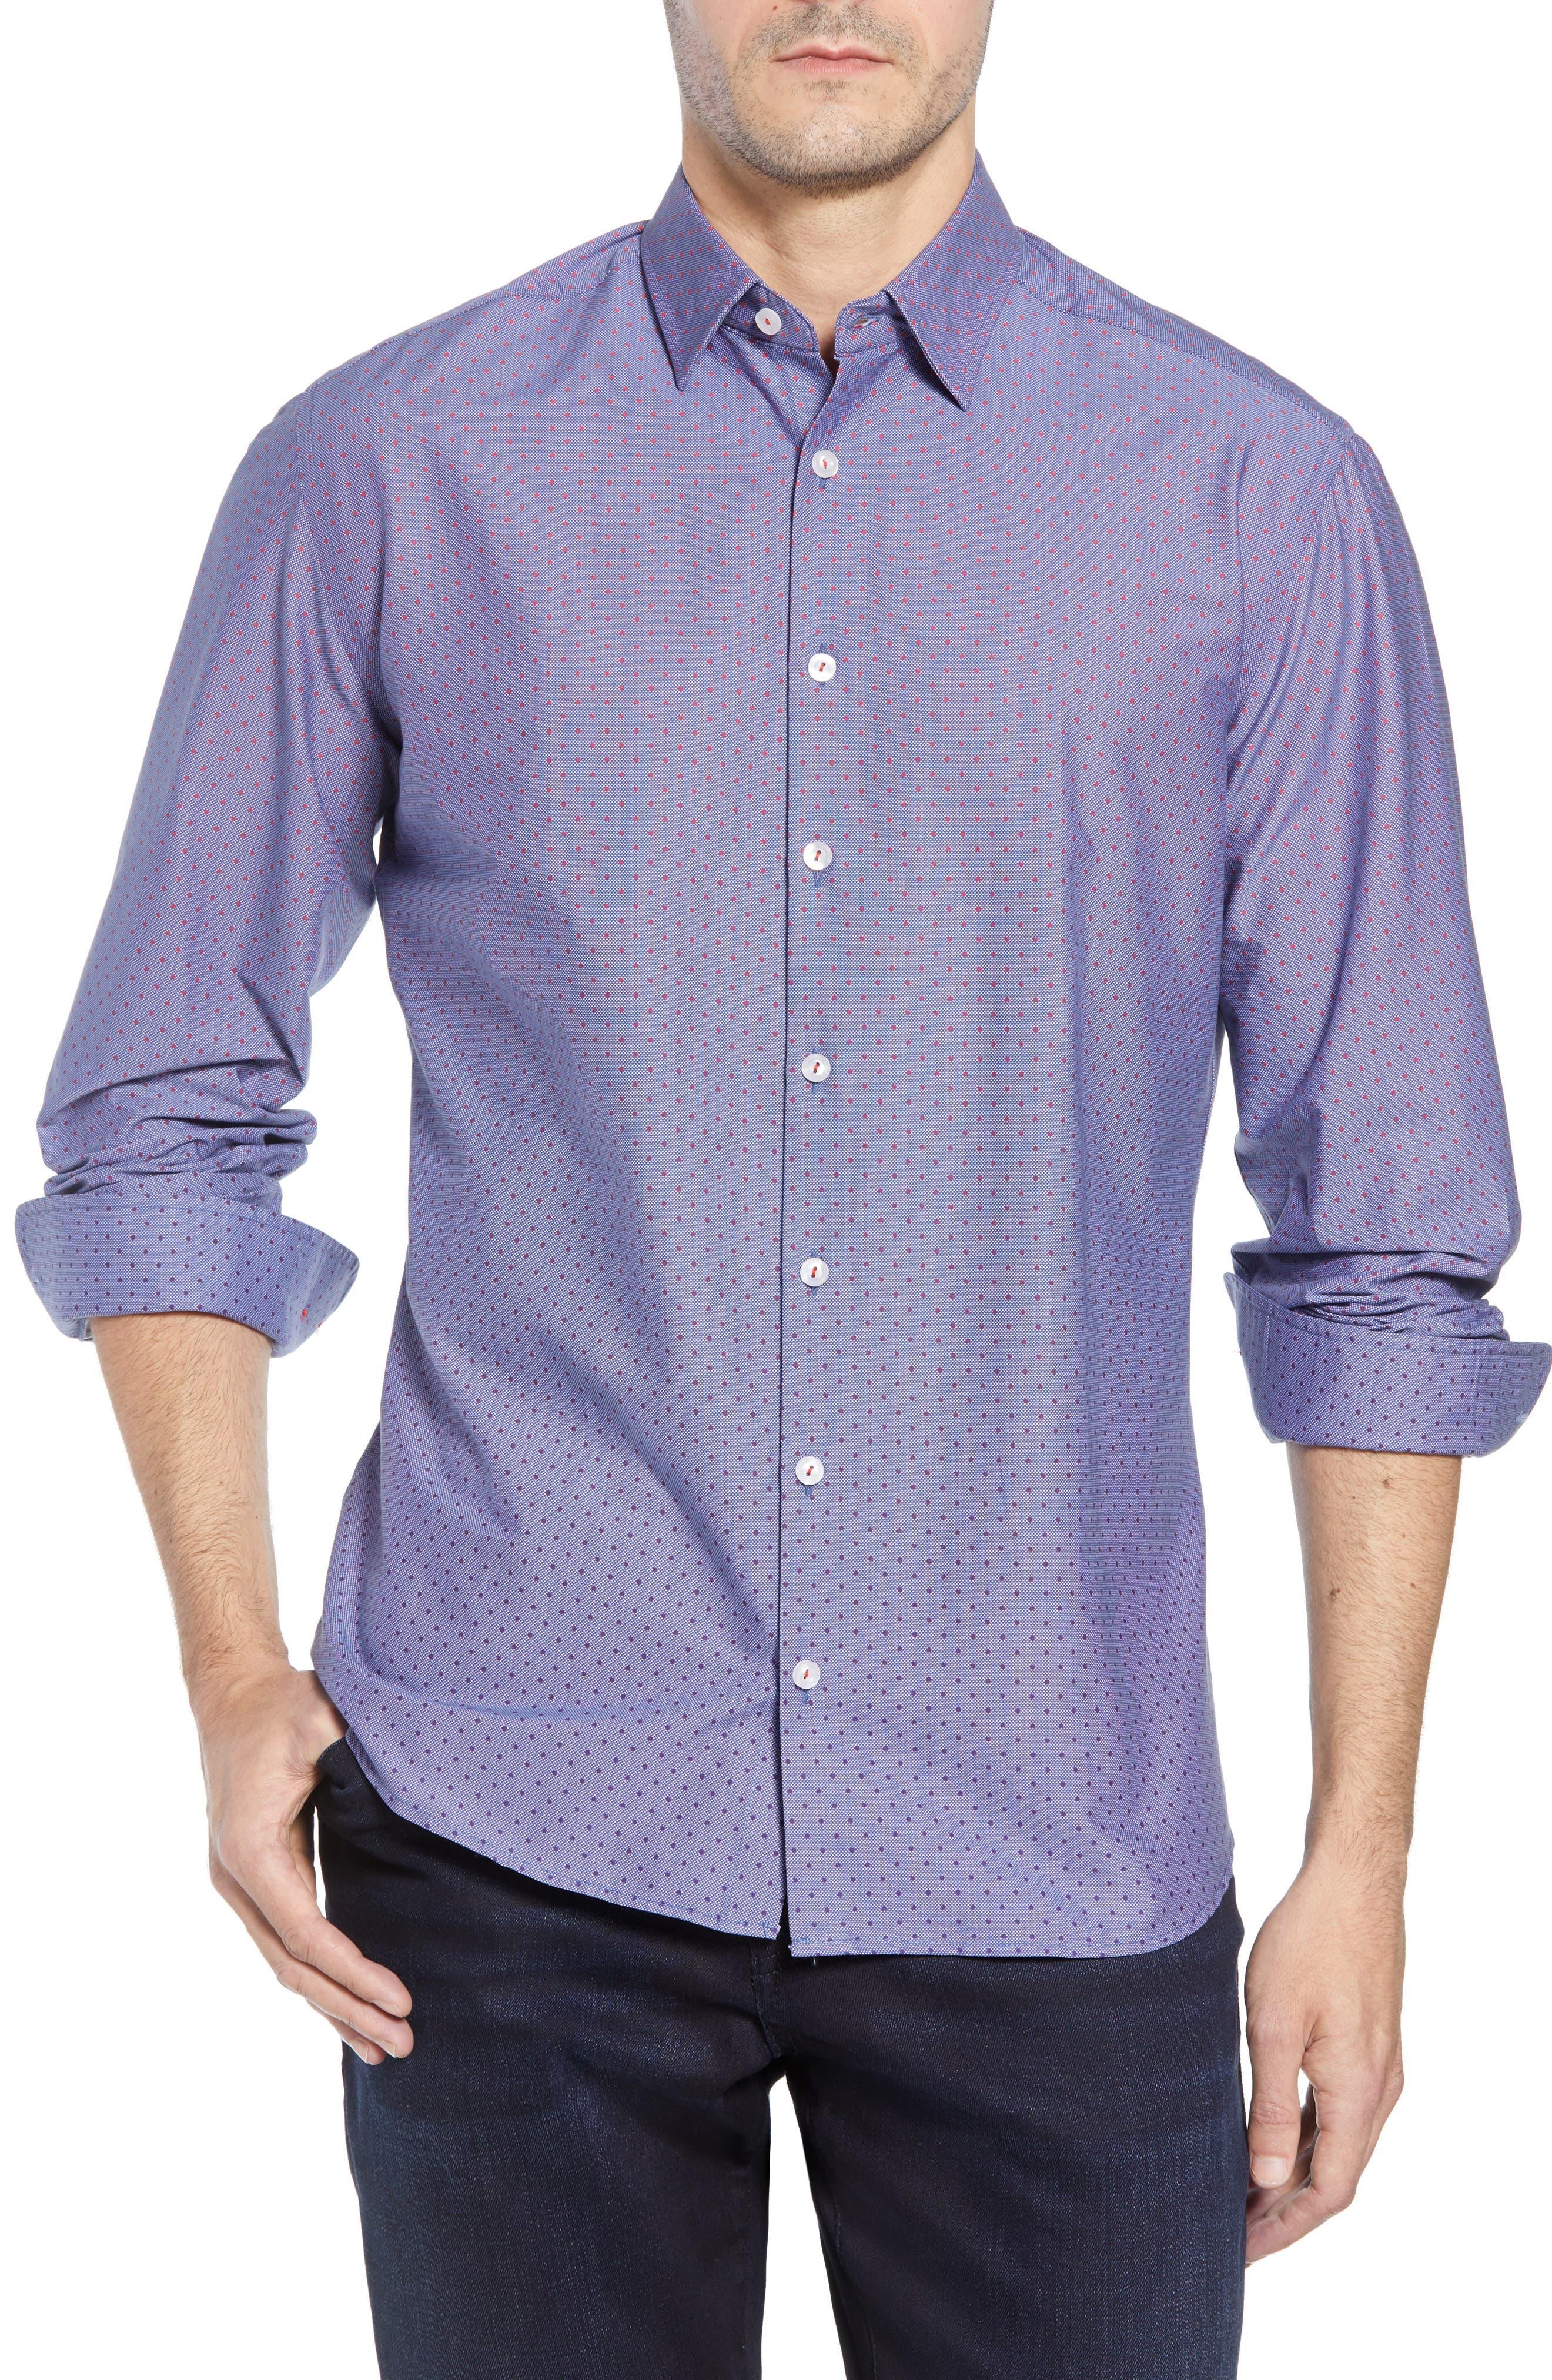 STONE ROSE,                             Gradient Dot Regular Fit Sport Shirt,                             Main thumbnail 1, color,                             400